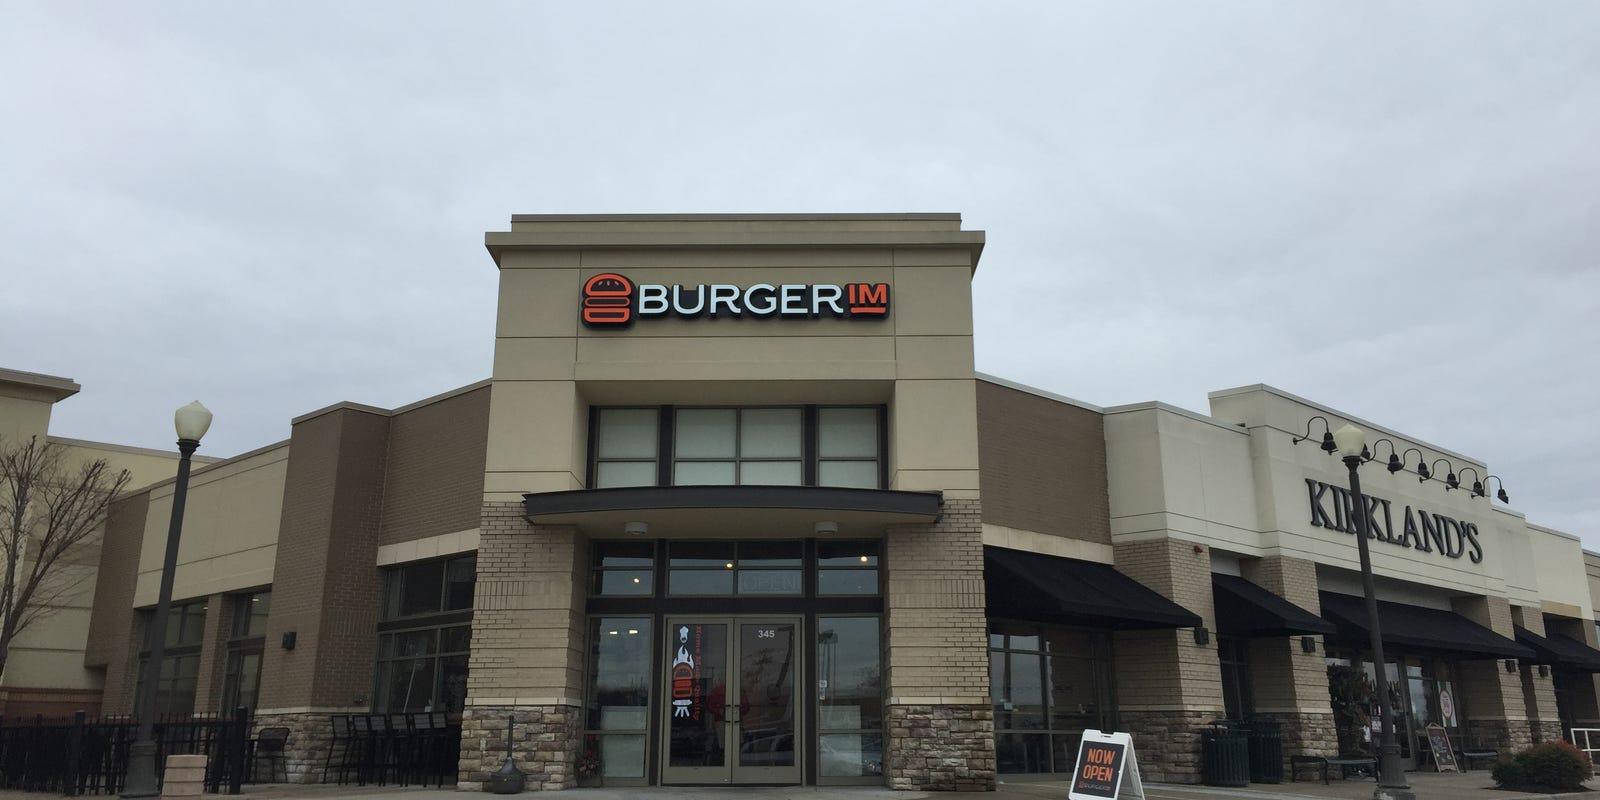 Burgerim Jason S Deli Hotels Lead Wilson County Building And New